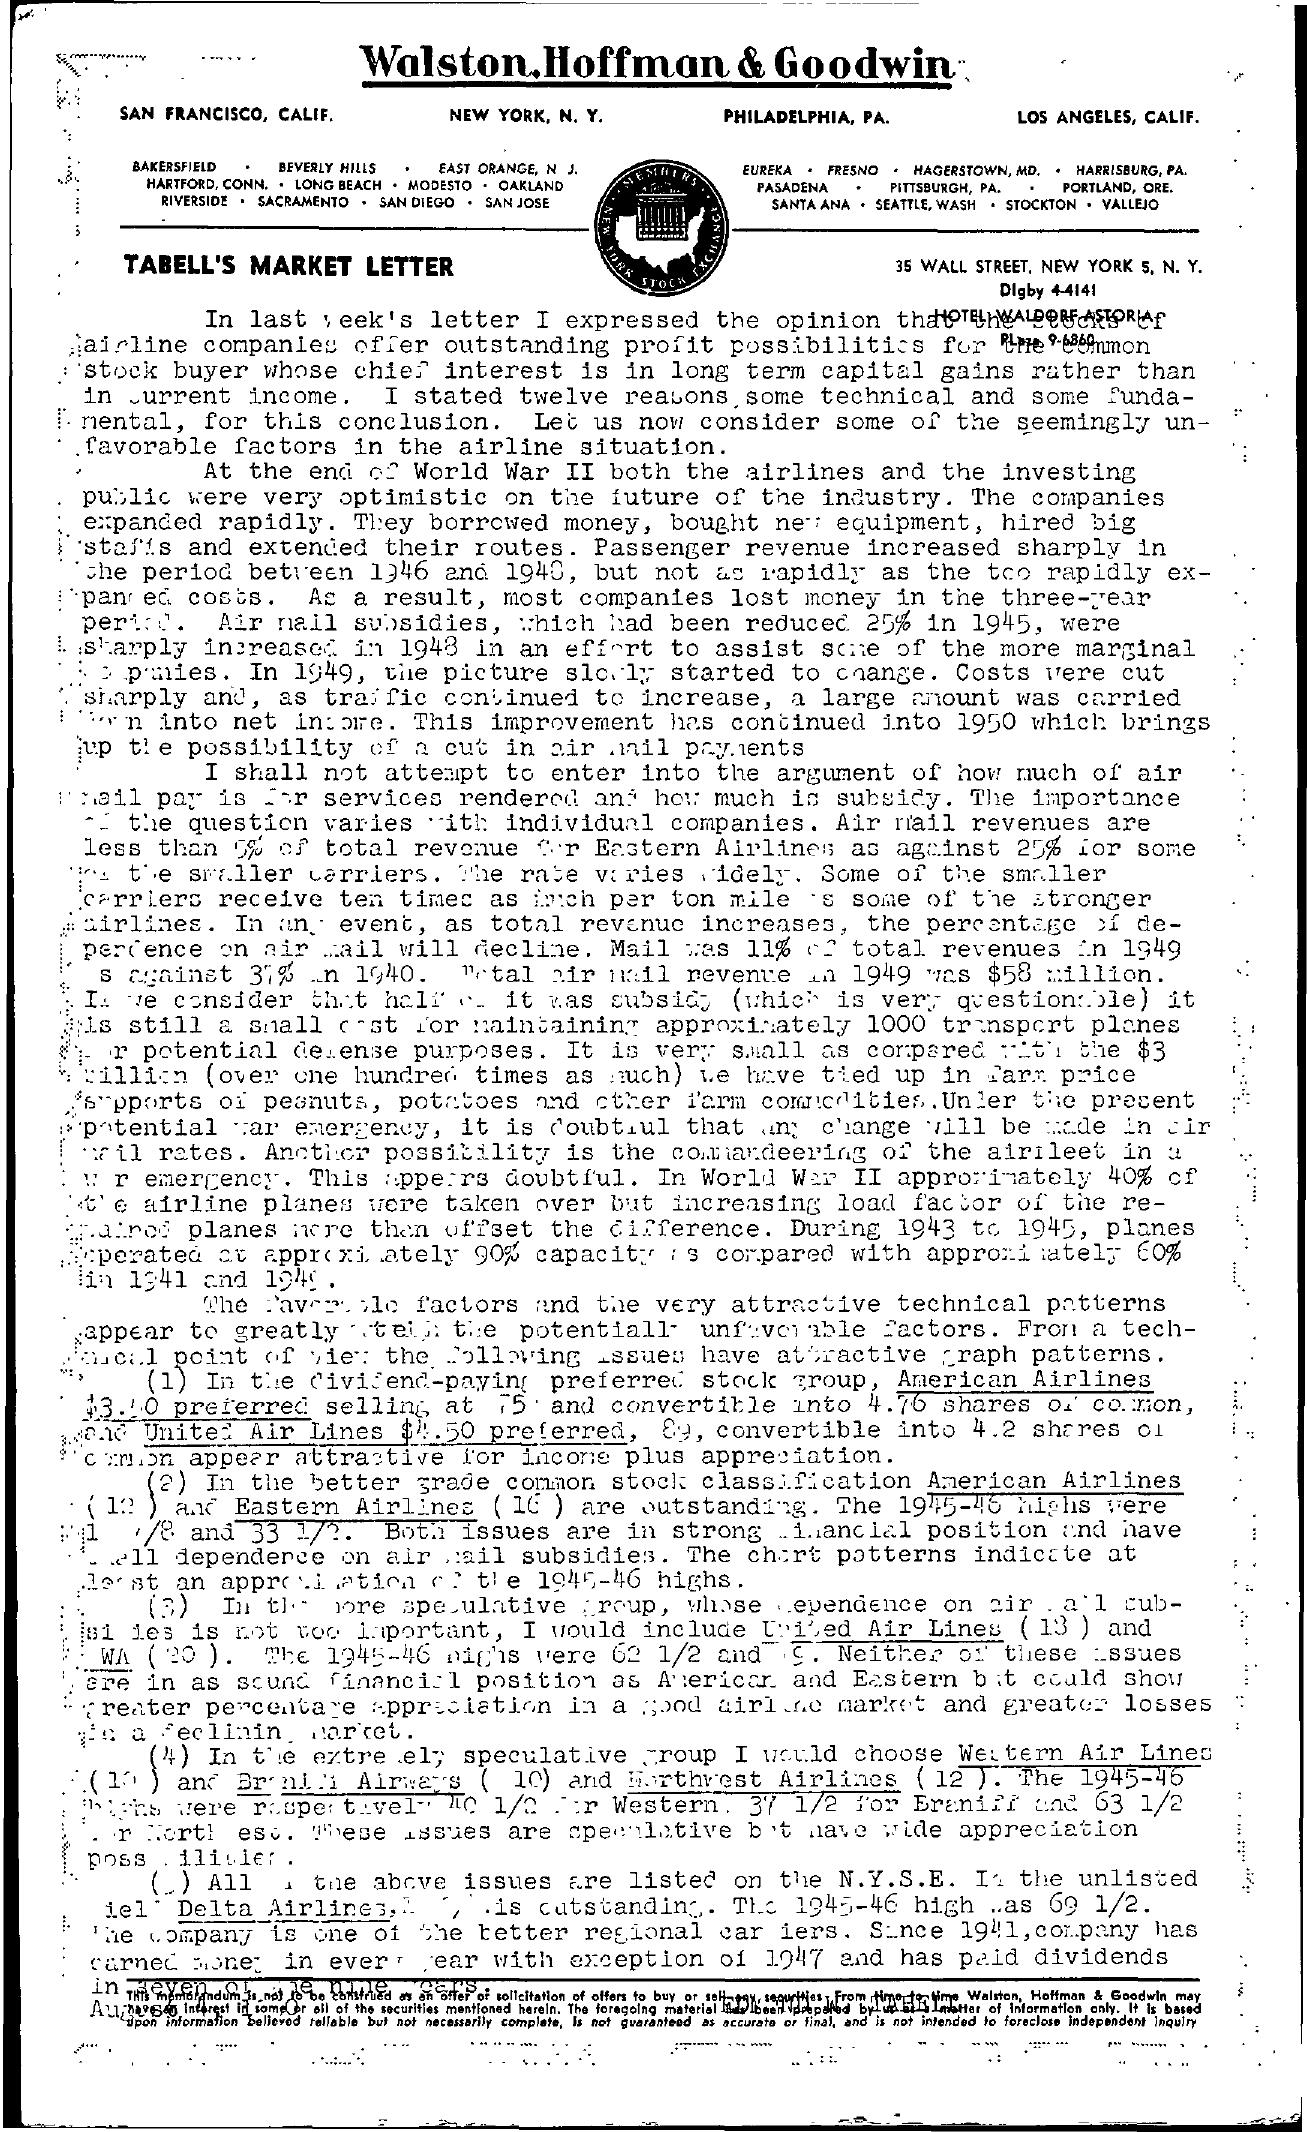 Tabell's Market Letter - August 04, 1950